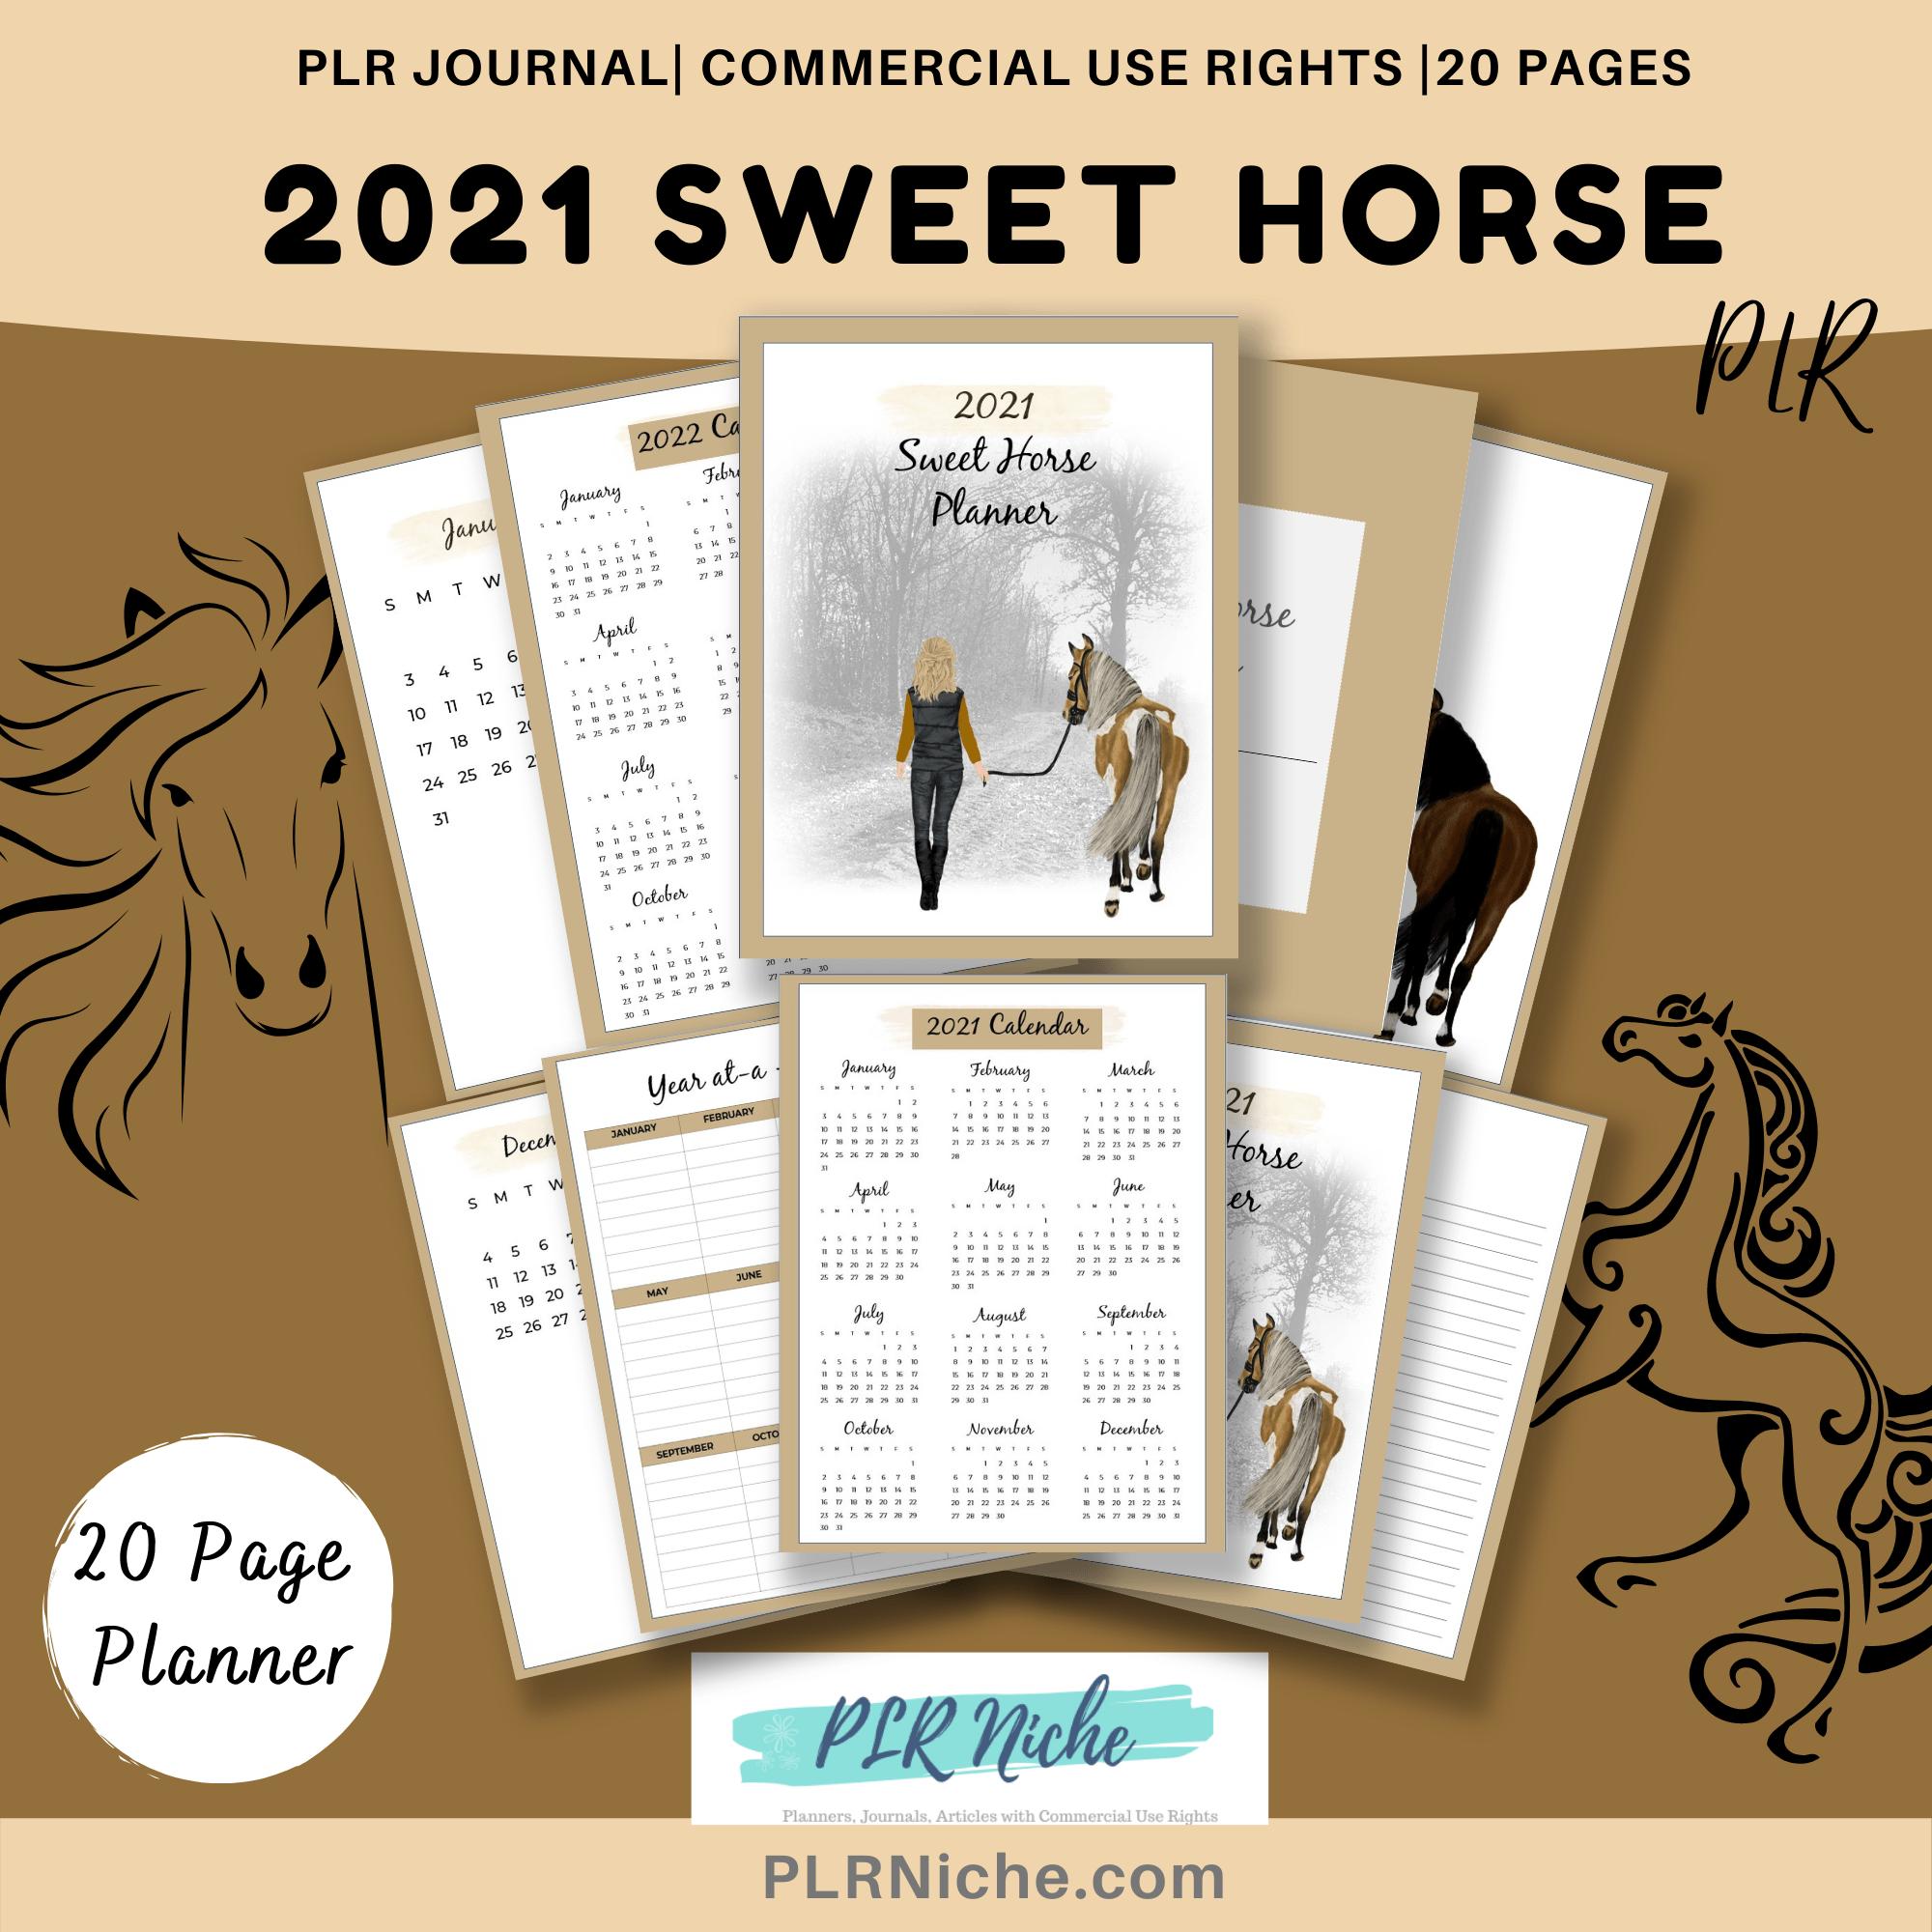 2021 Sweet Horse Planner